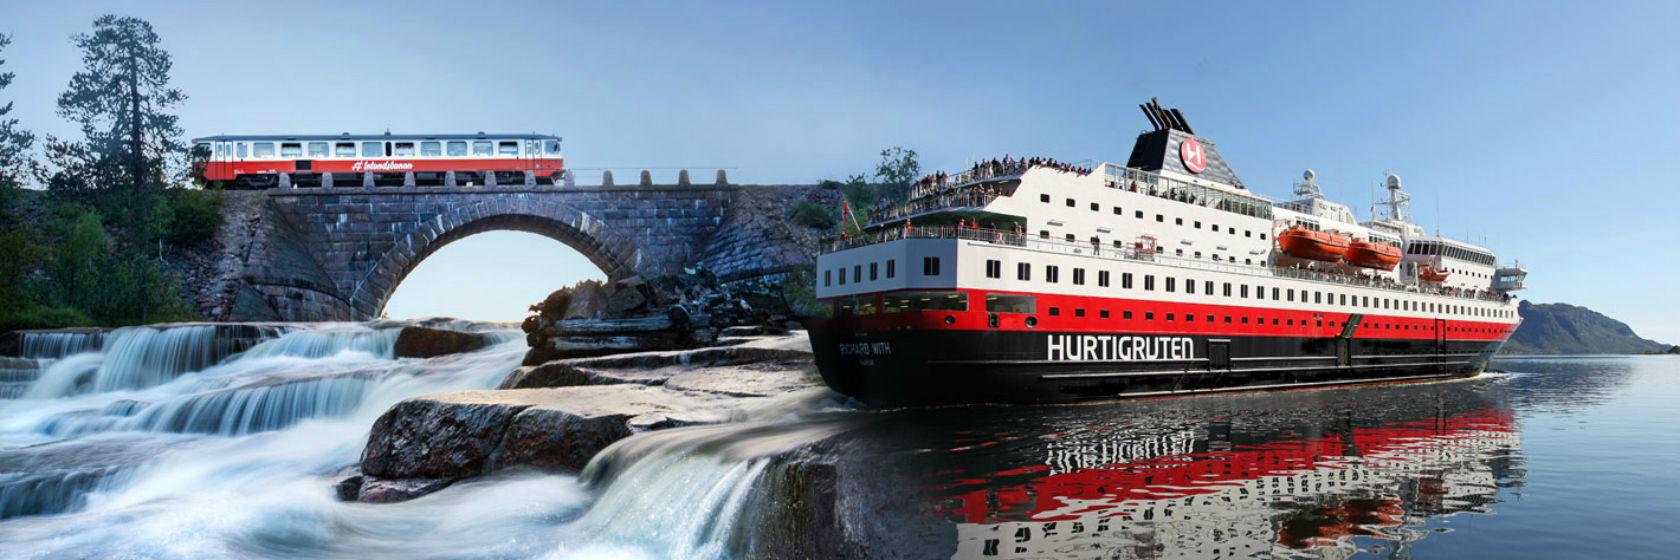 Inlandsbanan & Hurtigruten